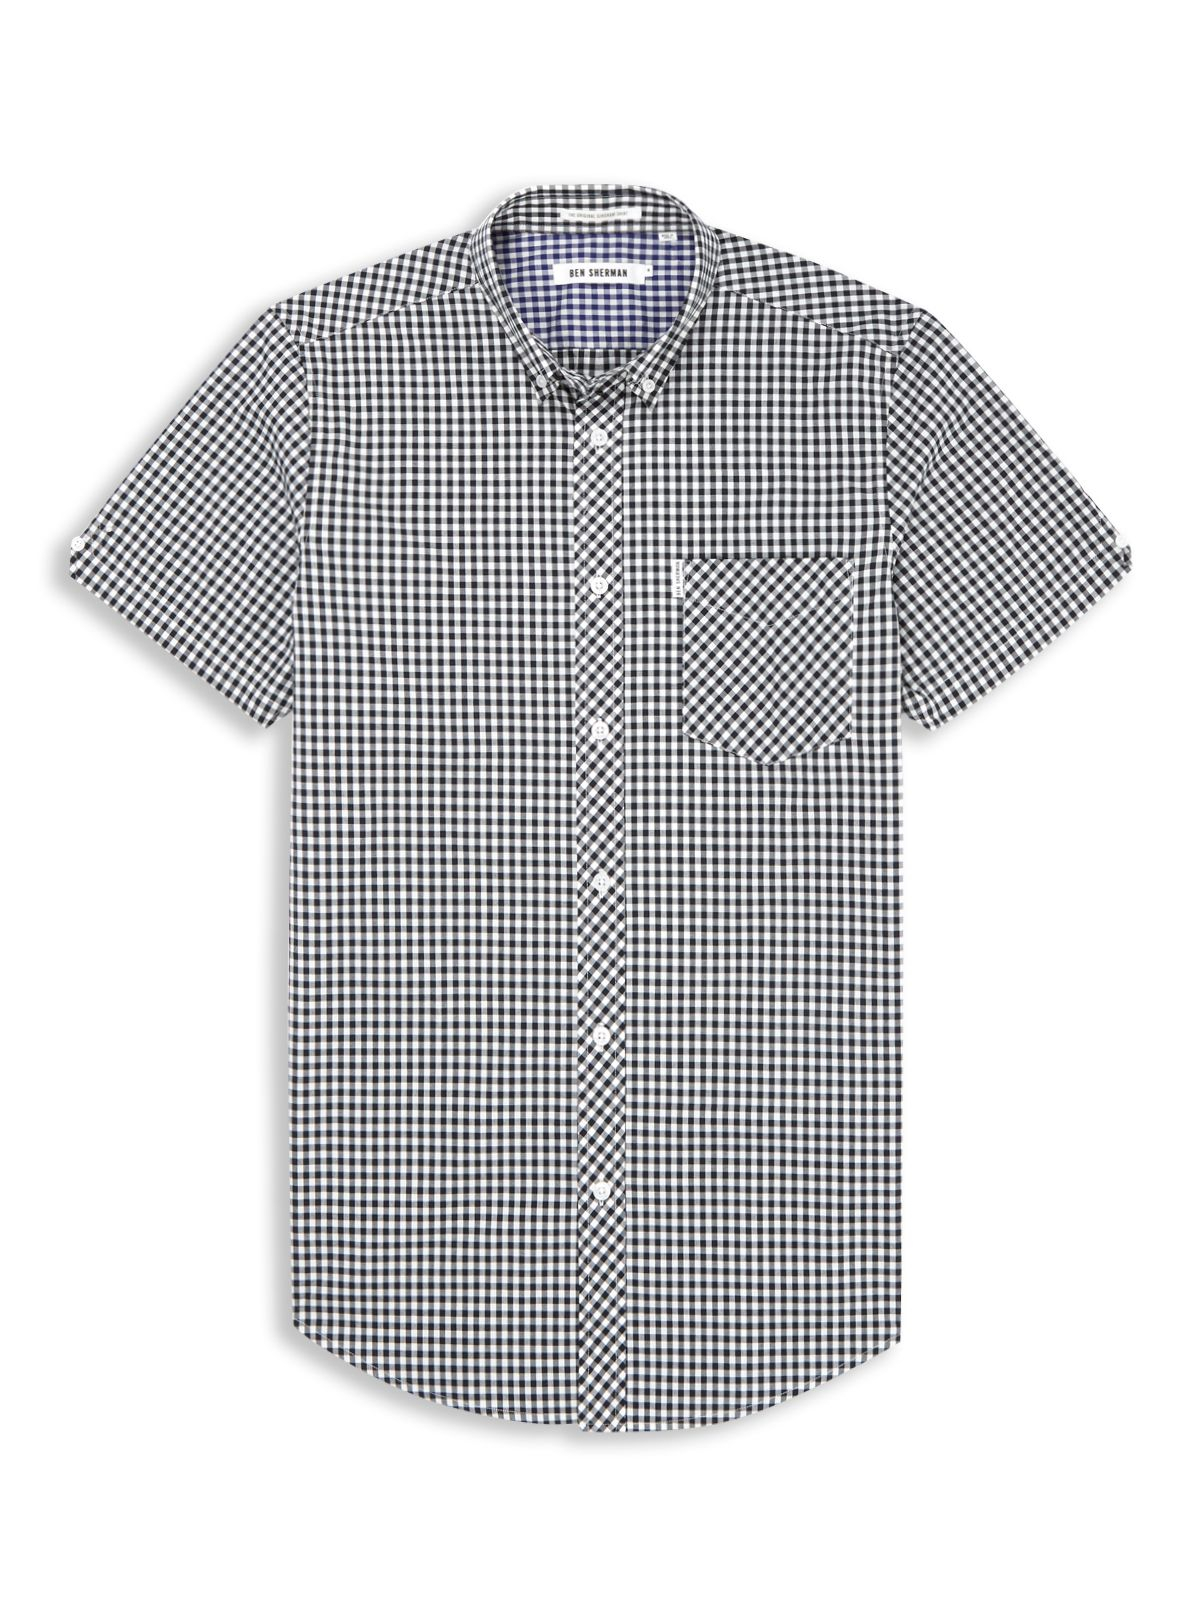 Ben Sherman Classic Gingham Check Short Sleeve Shirt In